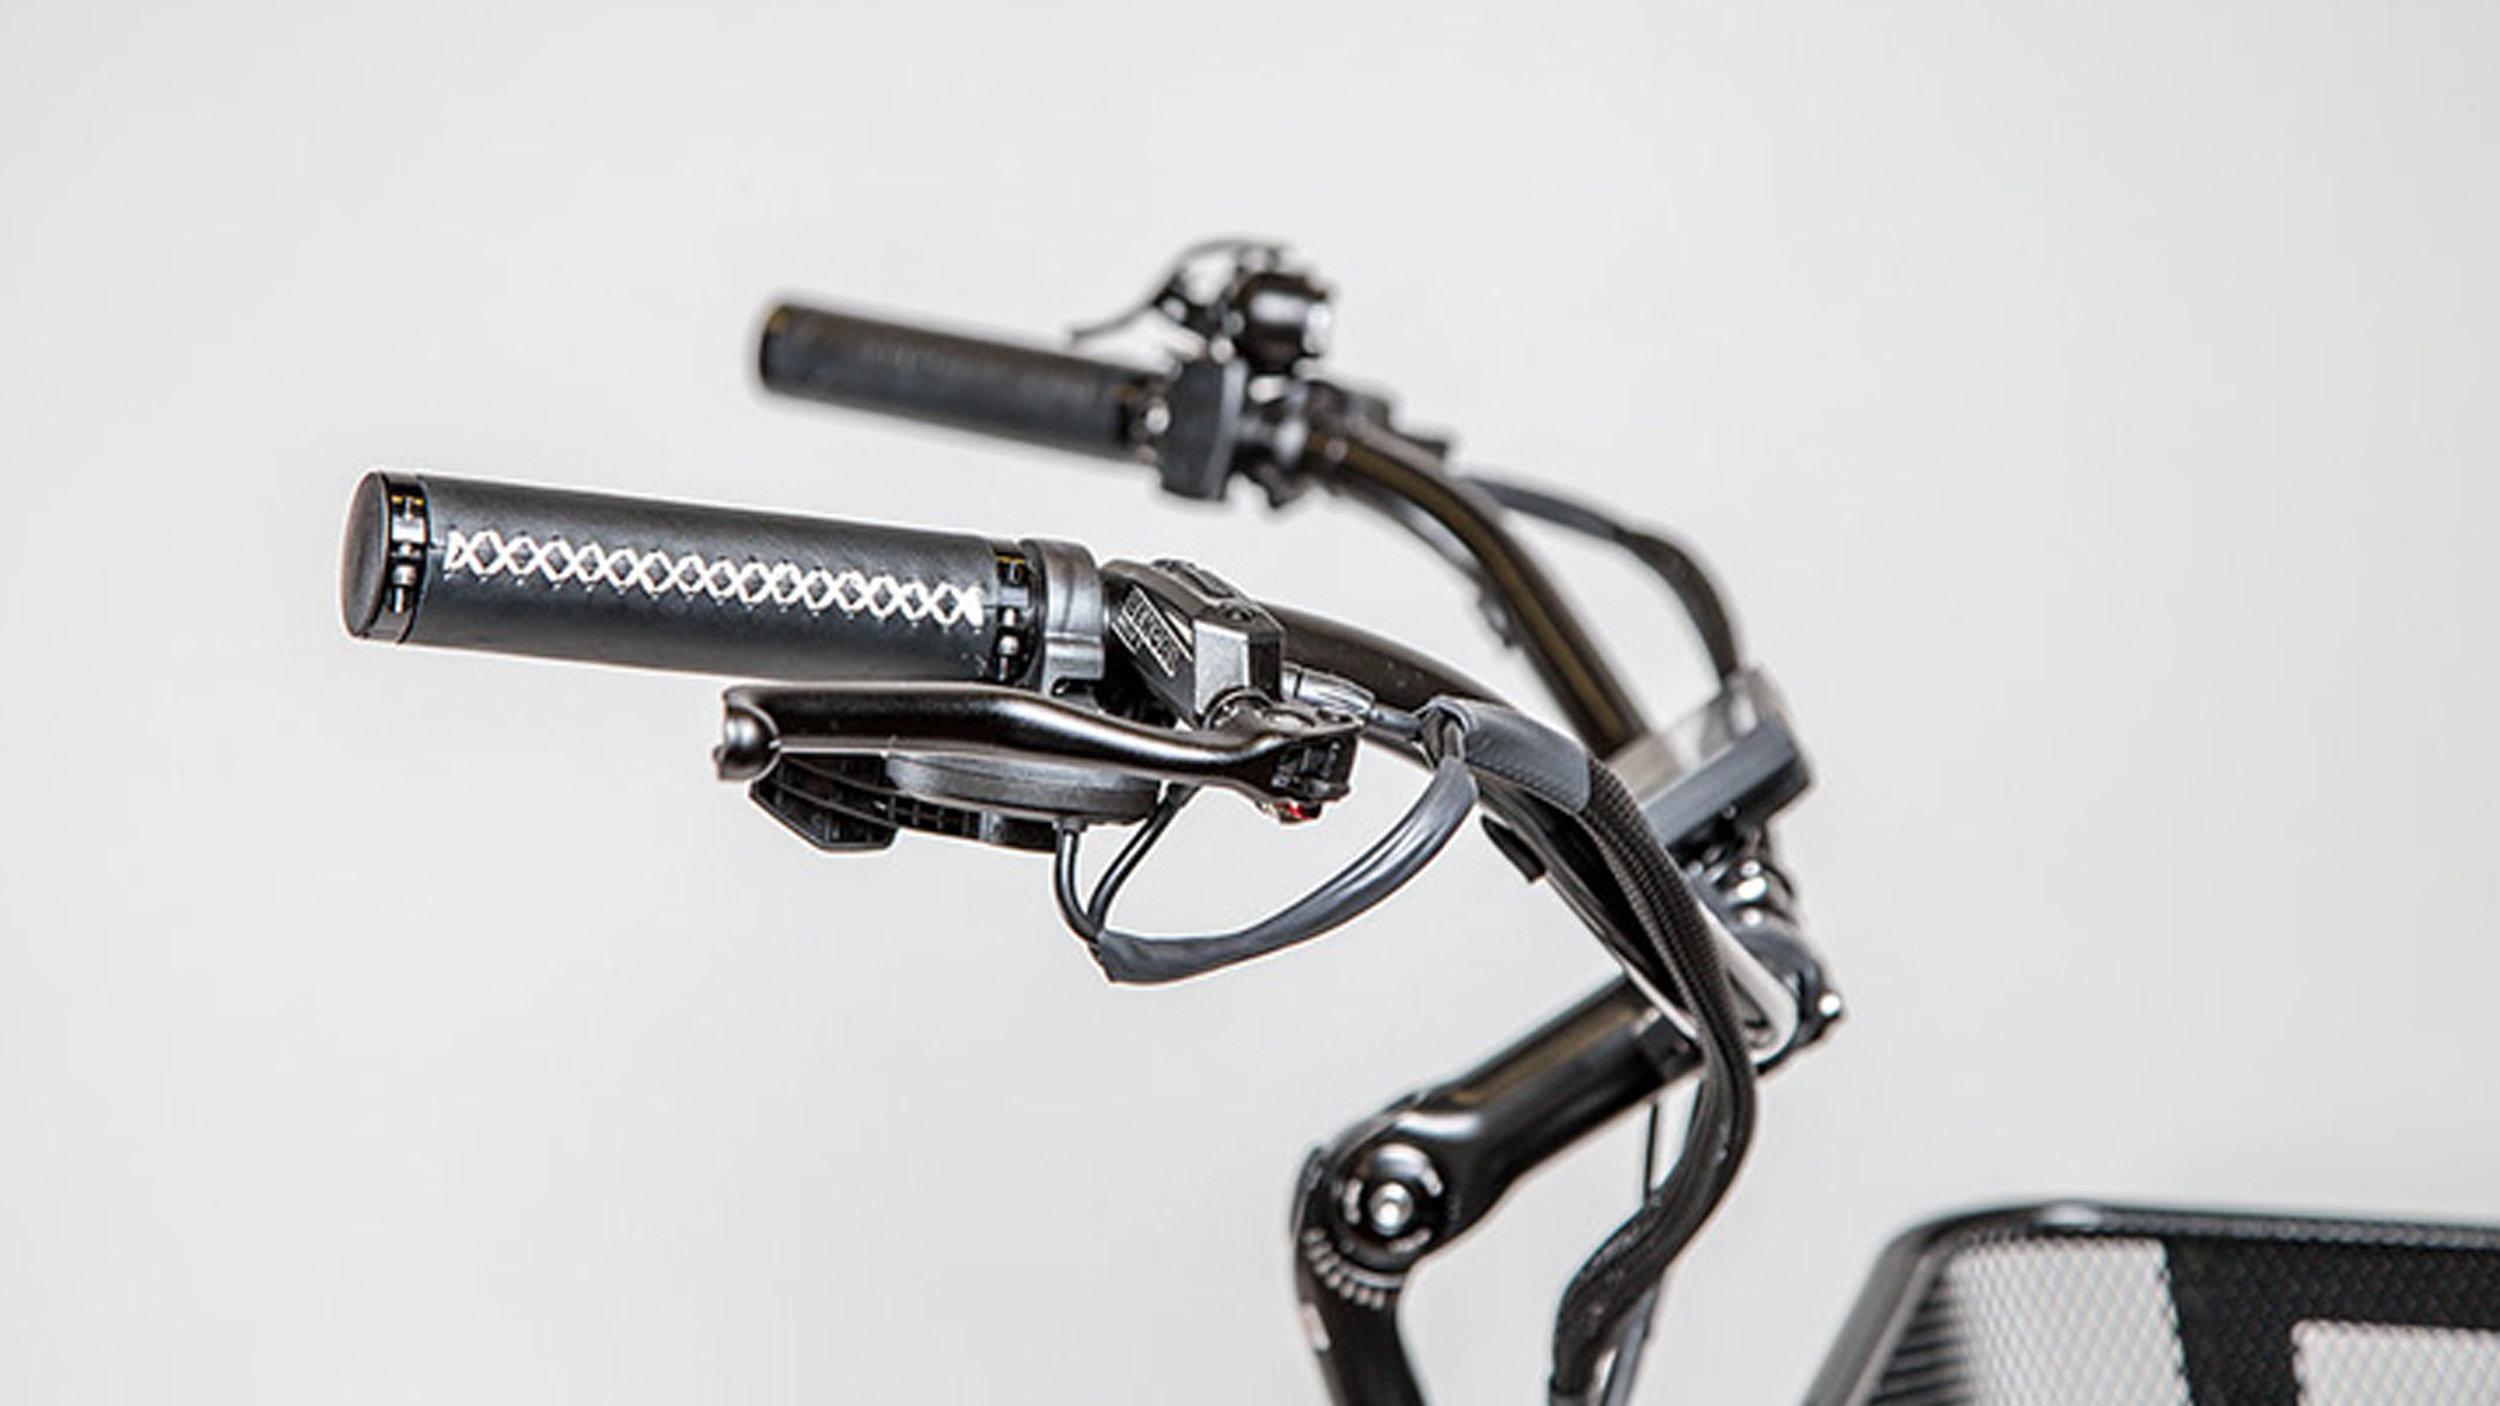 electrified-reviews-electric-bike-company-model-c-electric-bike-review-grip.jpg